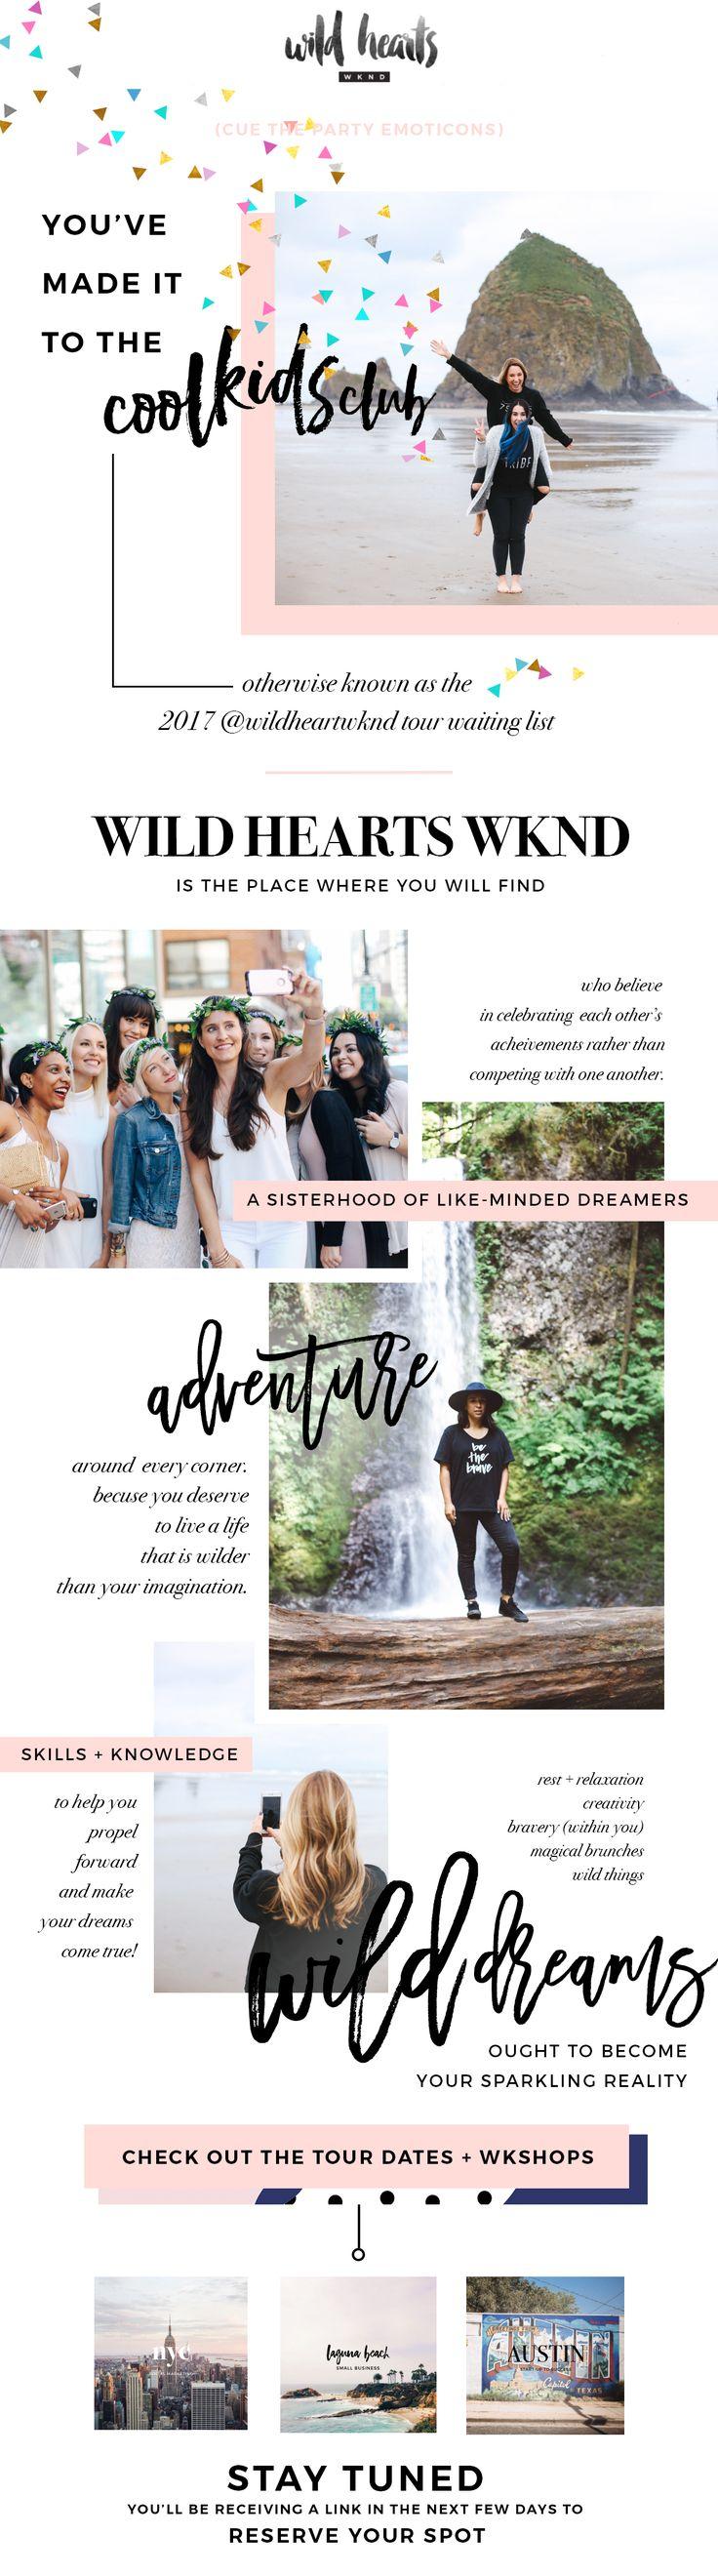 Newsletter Design by Lindsey Eryn Clark of Third Story Apartment.  Client: @wildheartswknd  #NewsletterDesign #GraphicDesign